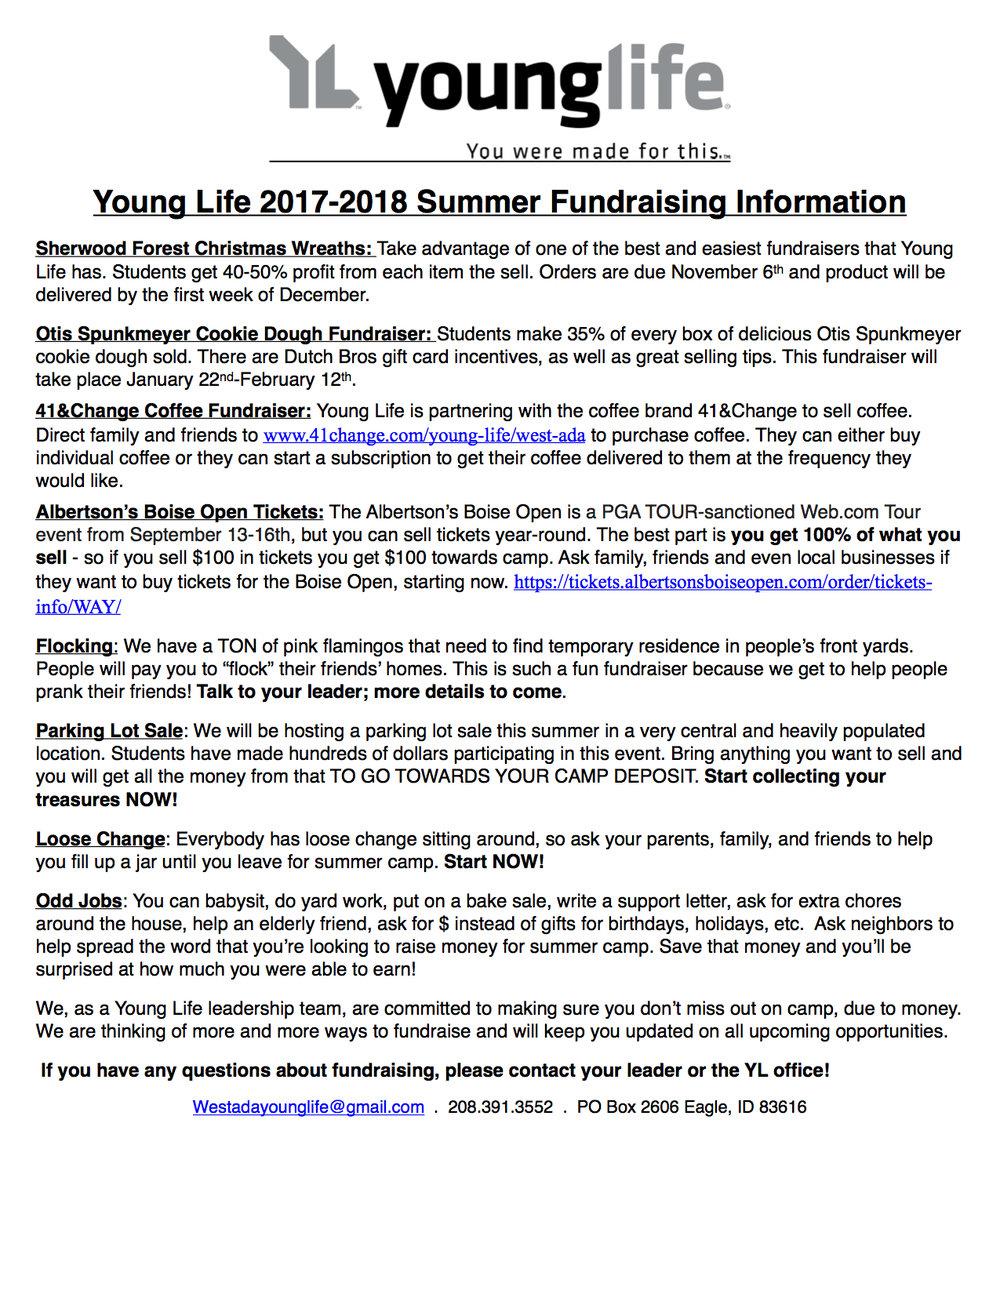 2017-2018 Camp Fundraiser.jpg